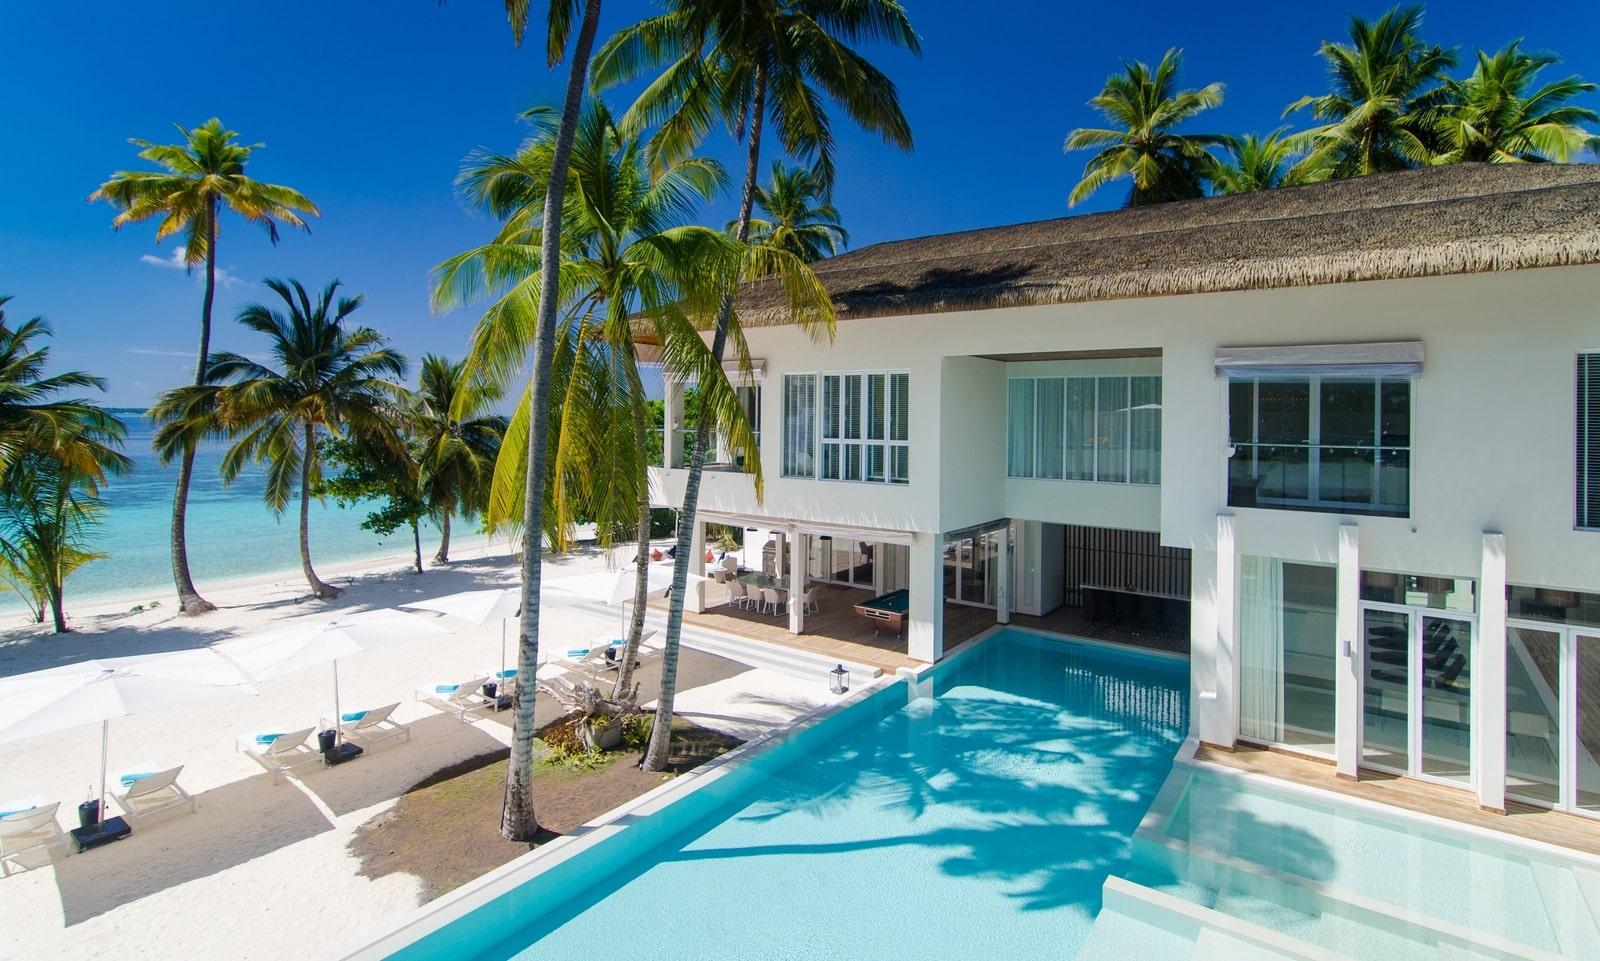 Мальдивы, Отель Amilla Fushi Maldives, номер The Amila Estate Residence